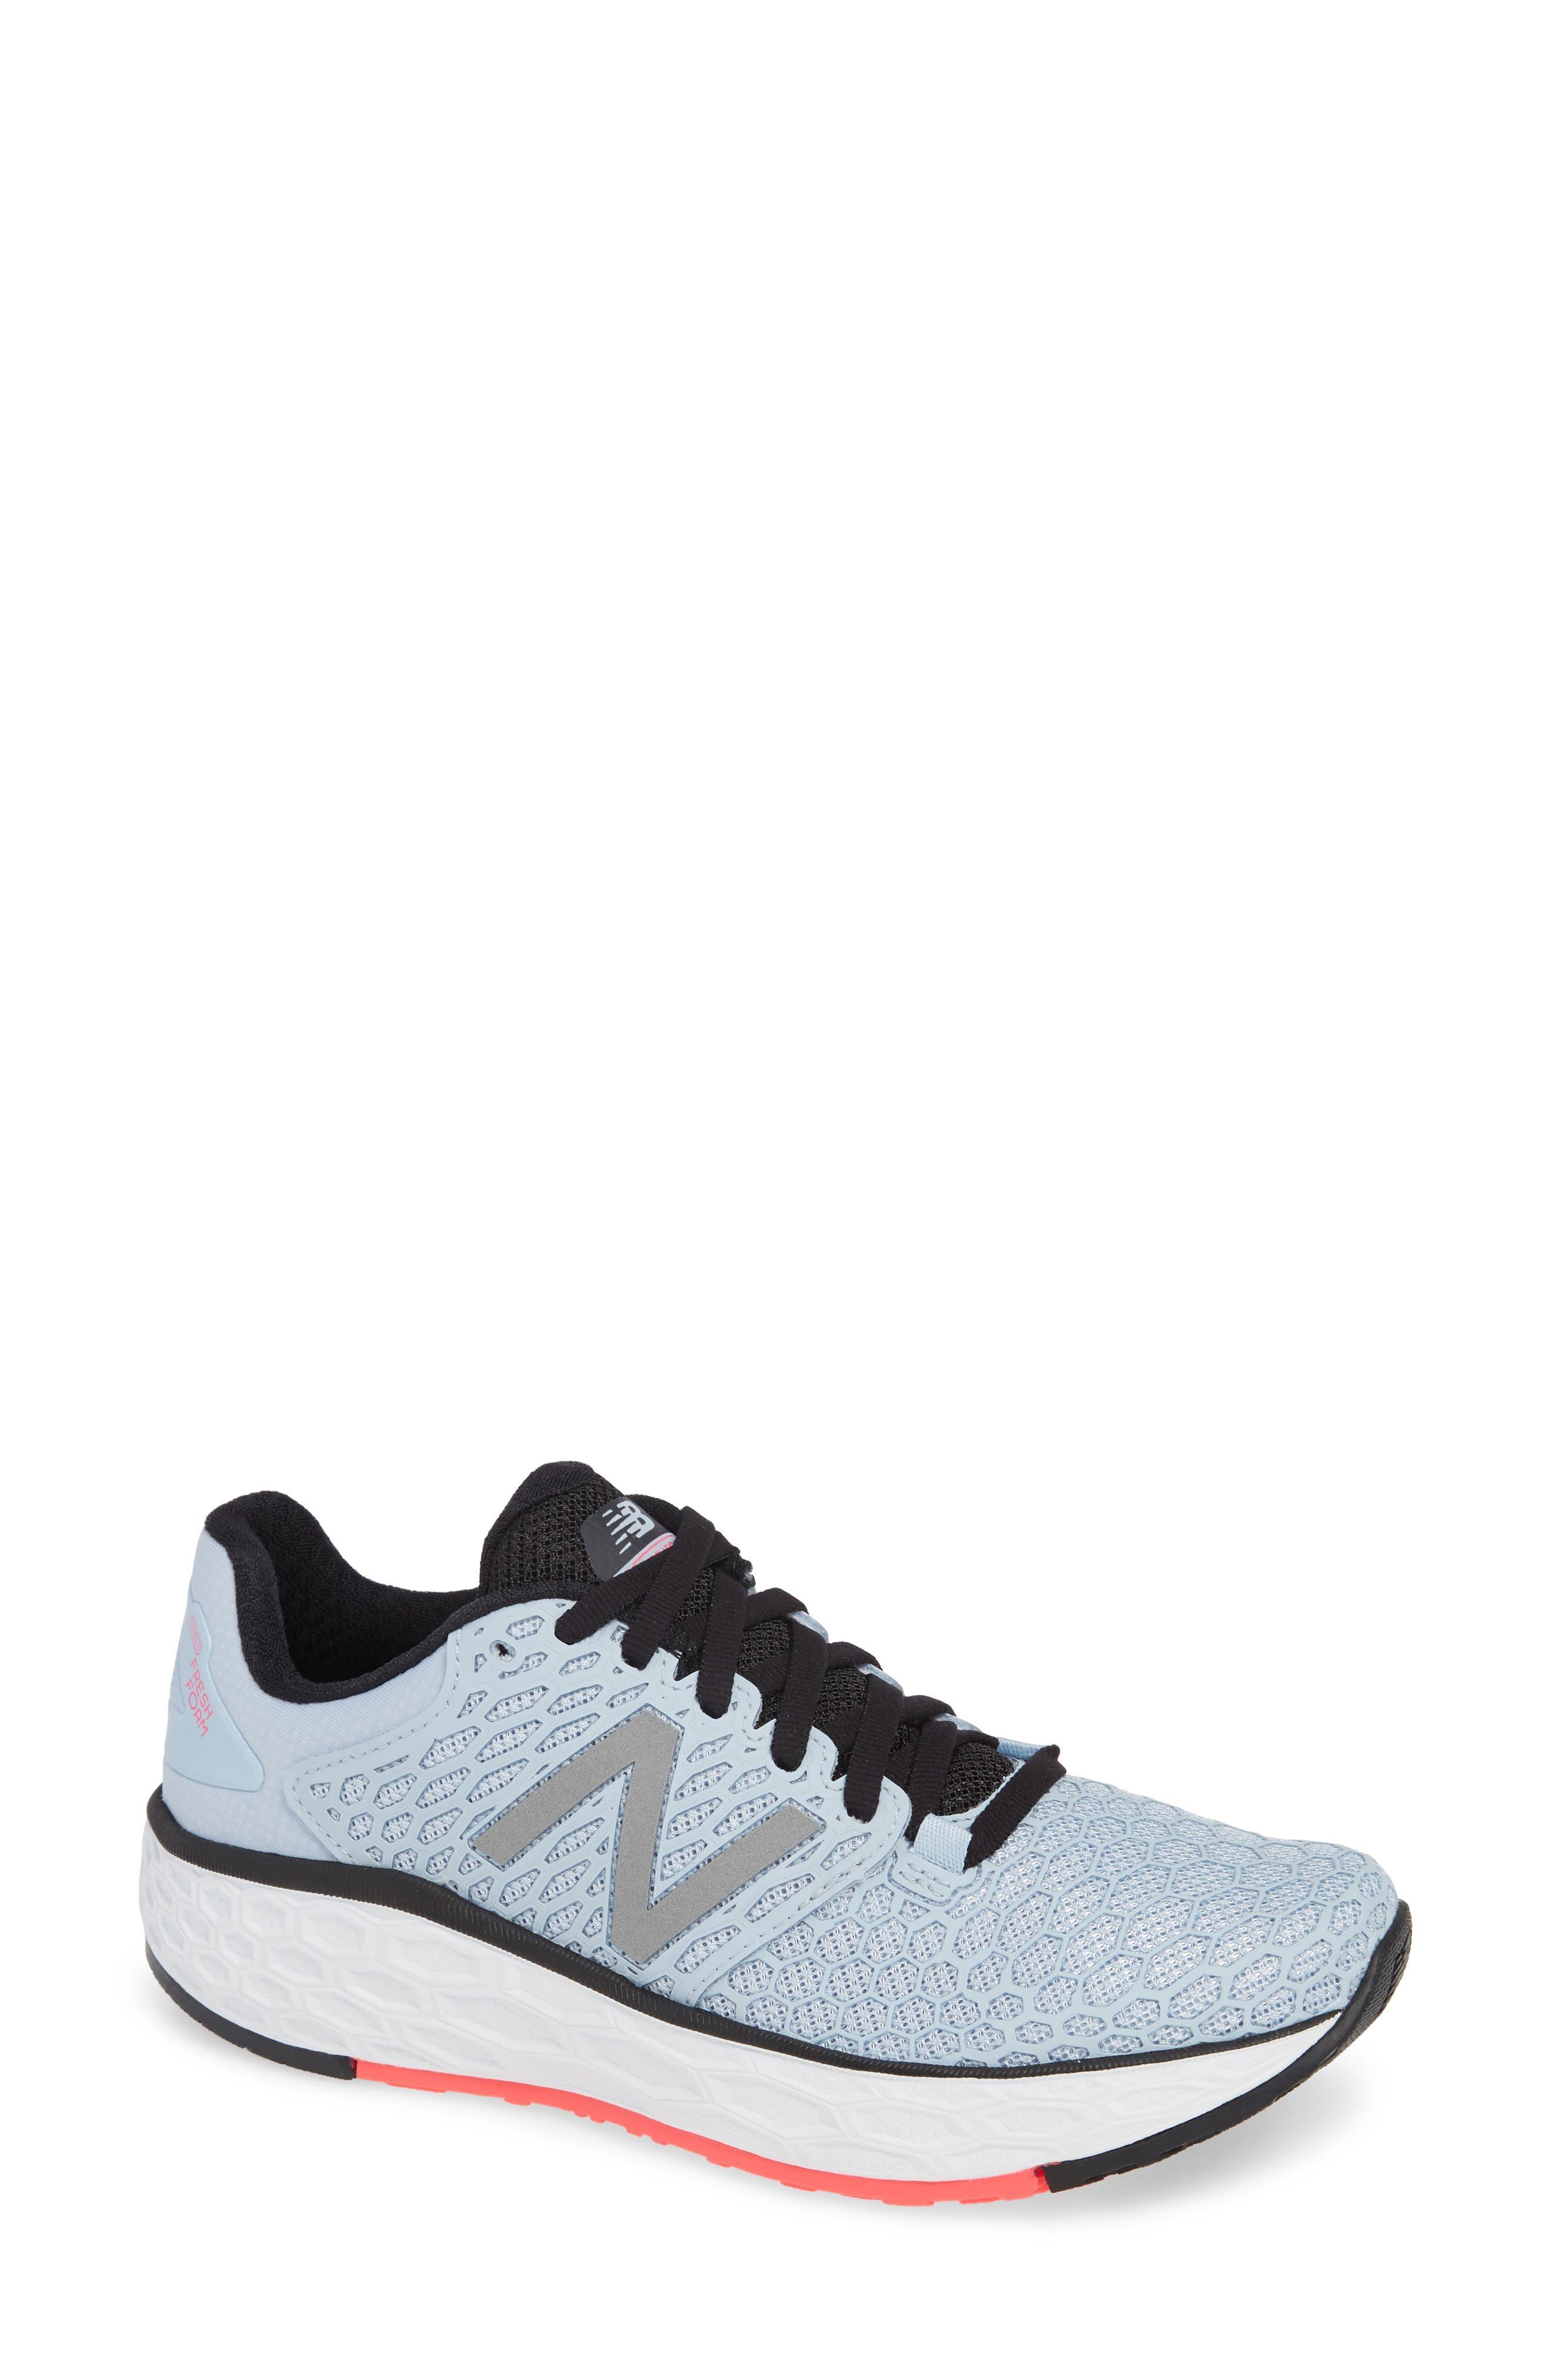 Fresh Foam Vongo Running Shoe,                             Main thumbnail 1, color,                             ICE BLUE